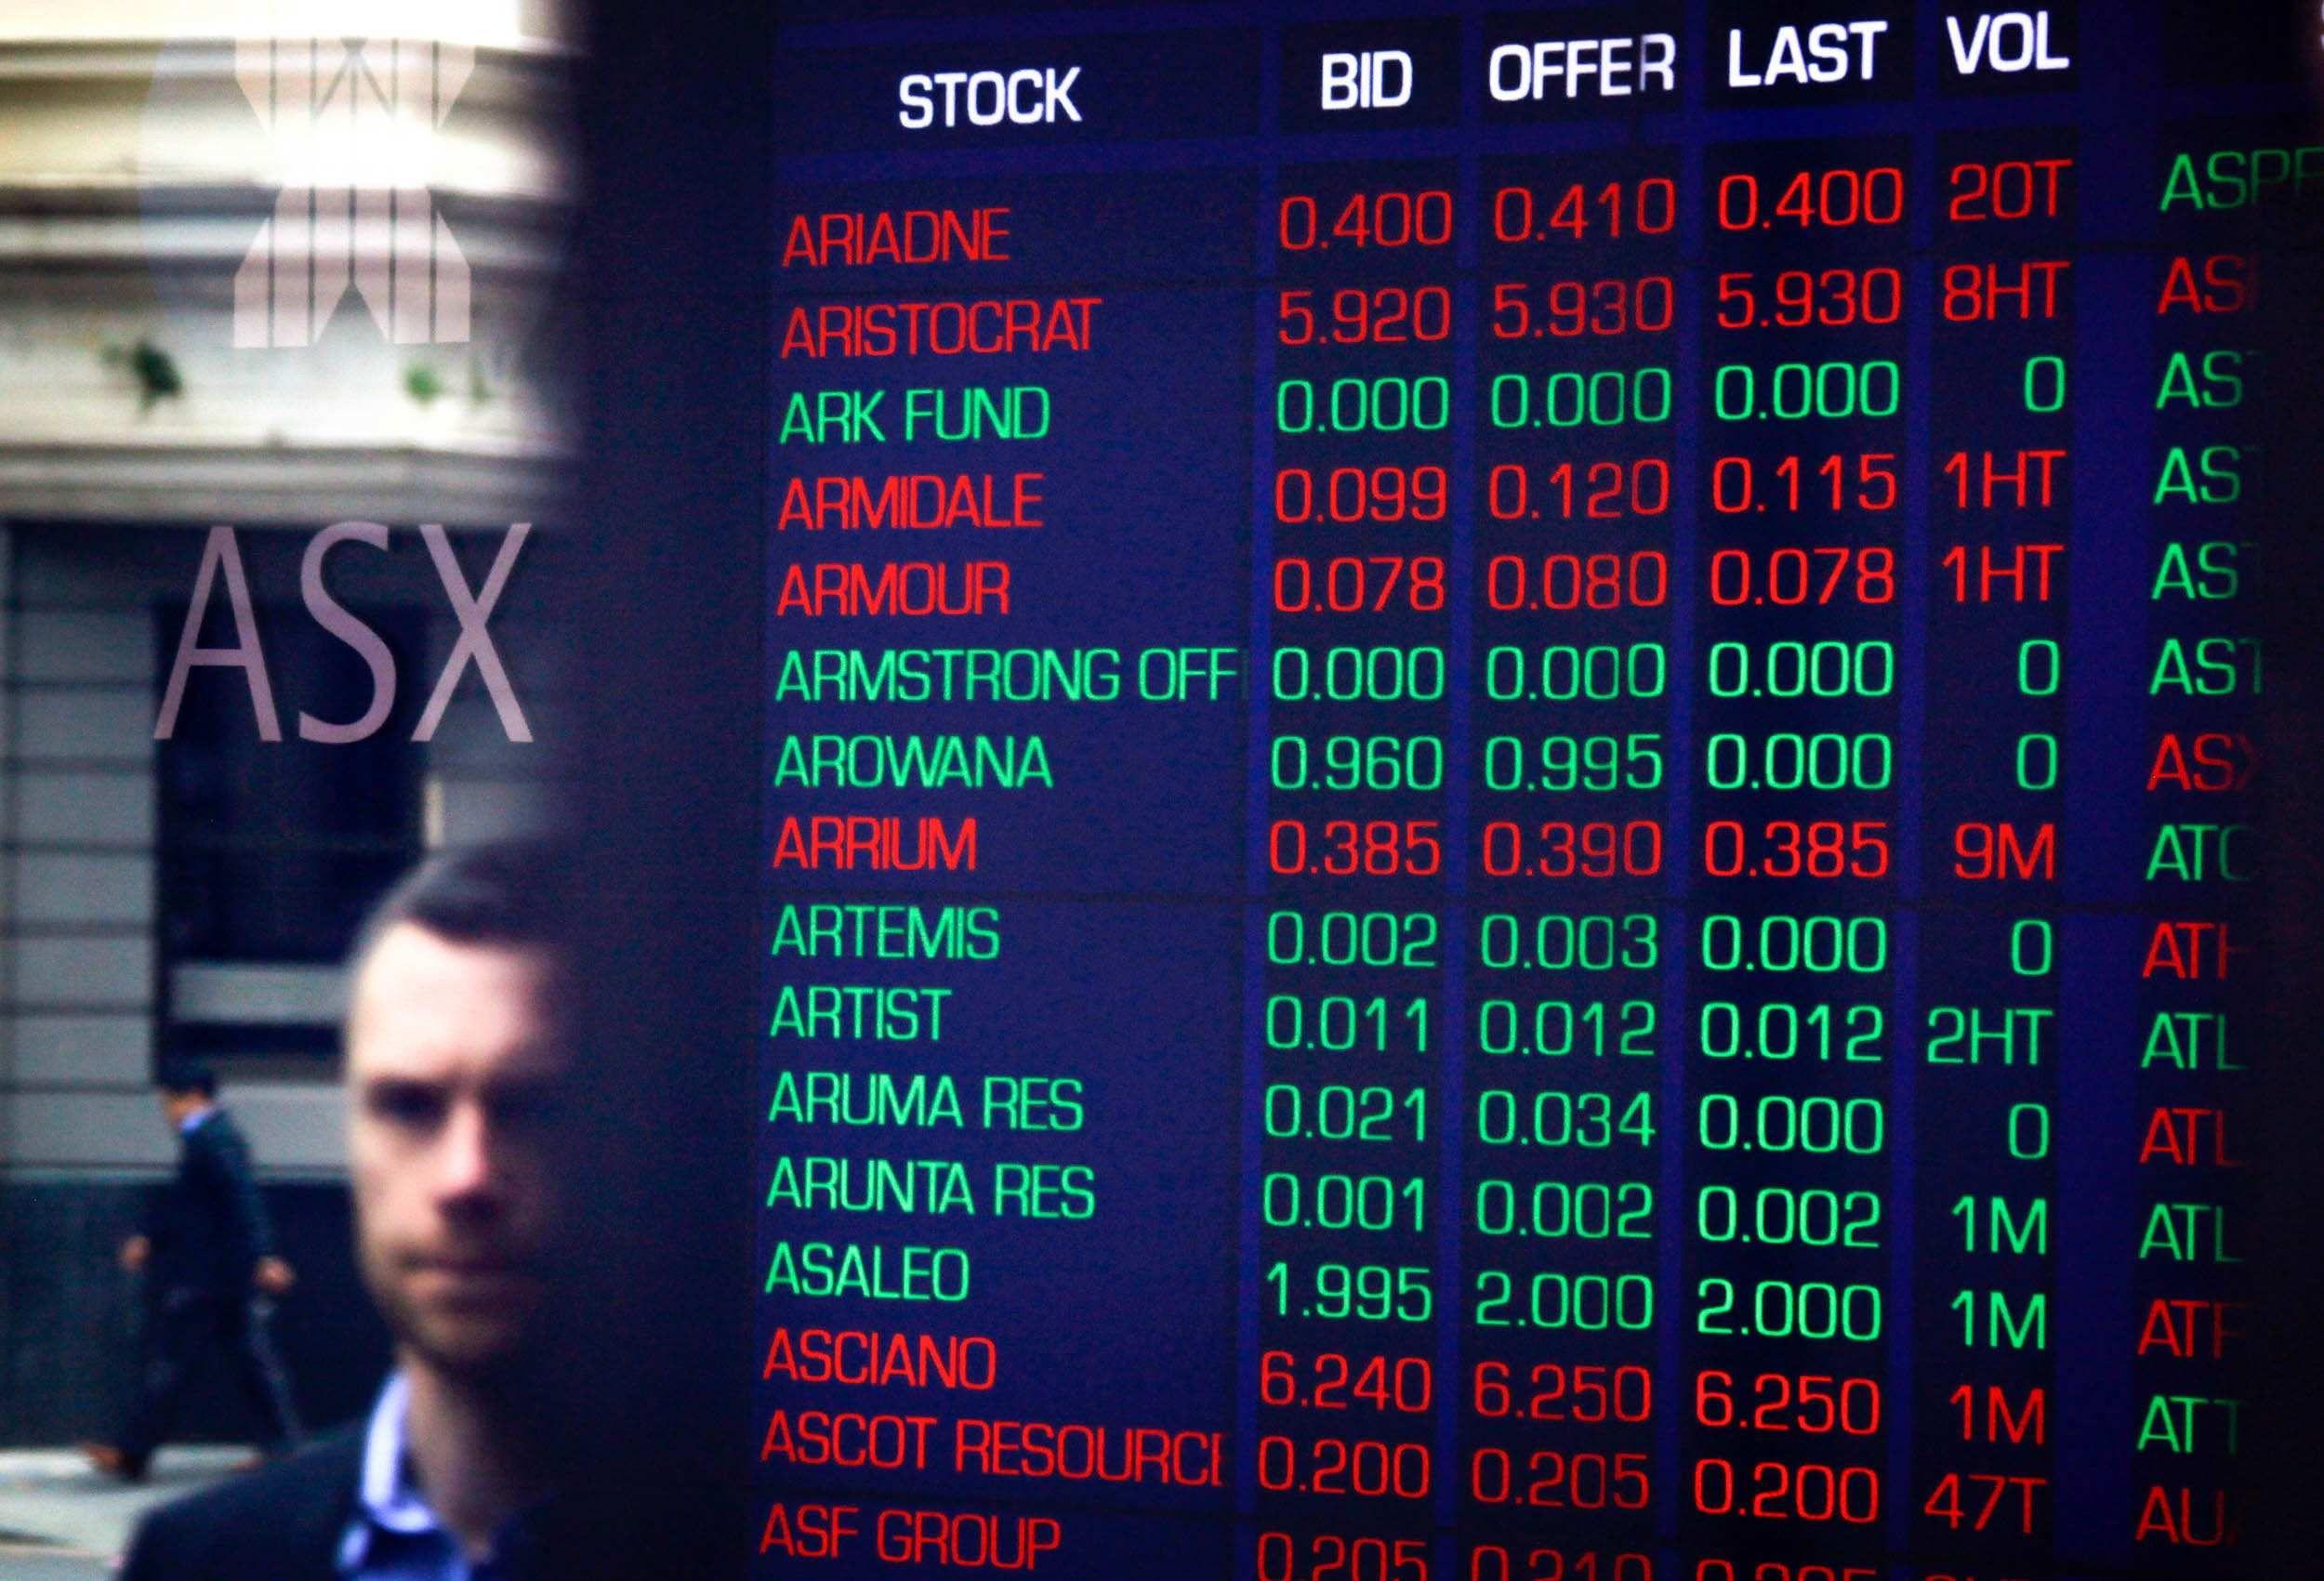 Daily analytics Latest news from Australia S&P/ASX 200